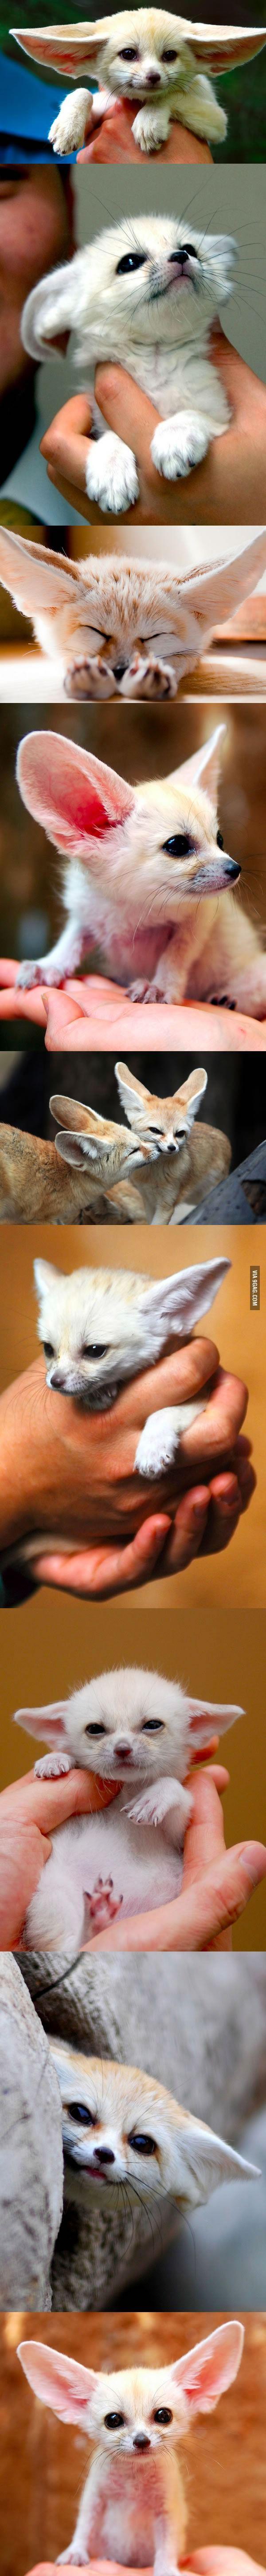 Fennec fox collection